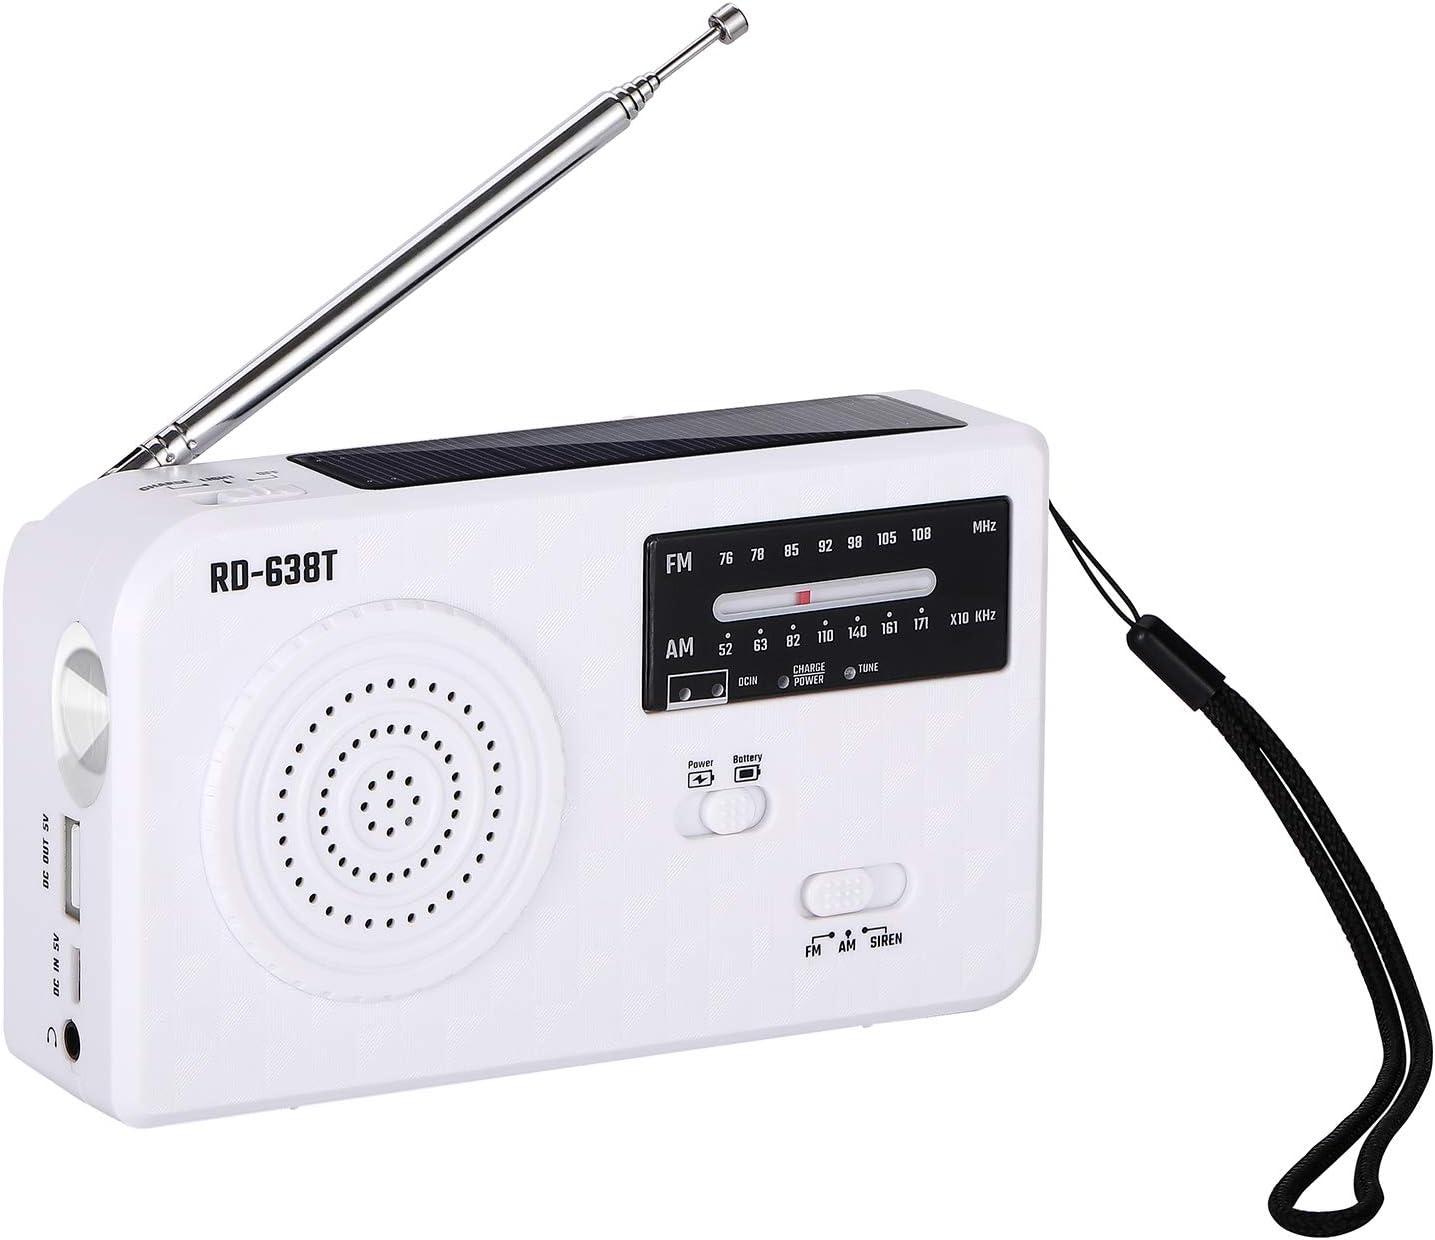 Solar Flashlight Radio Portable Fixed price for sale Emergency New sales Hand Powere Self Crank